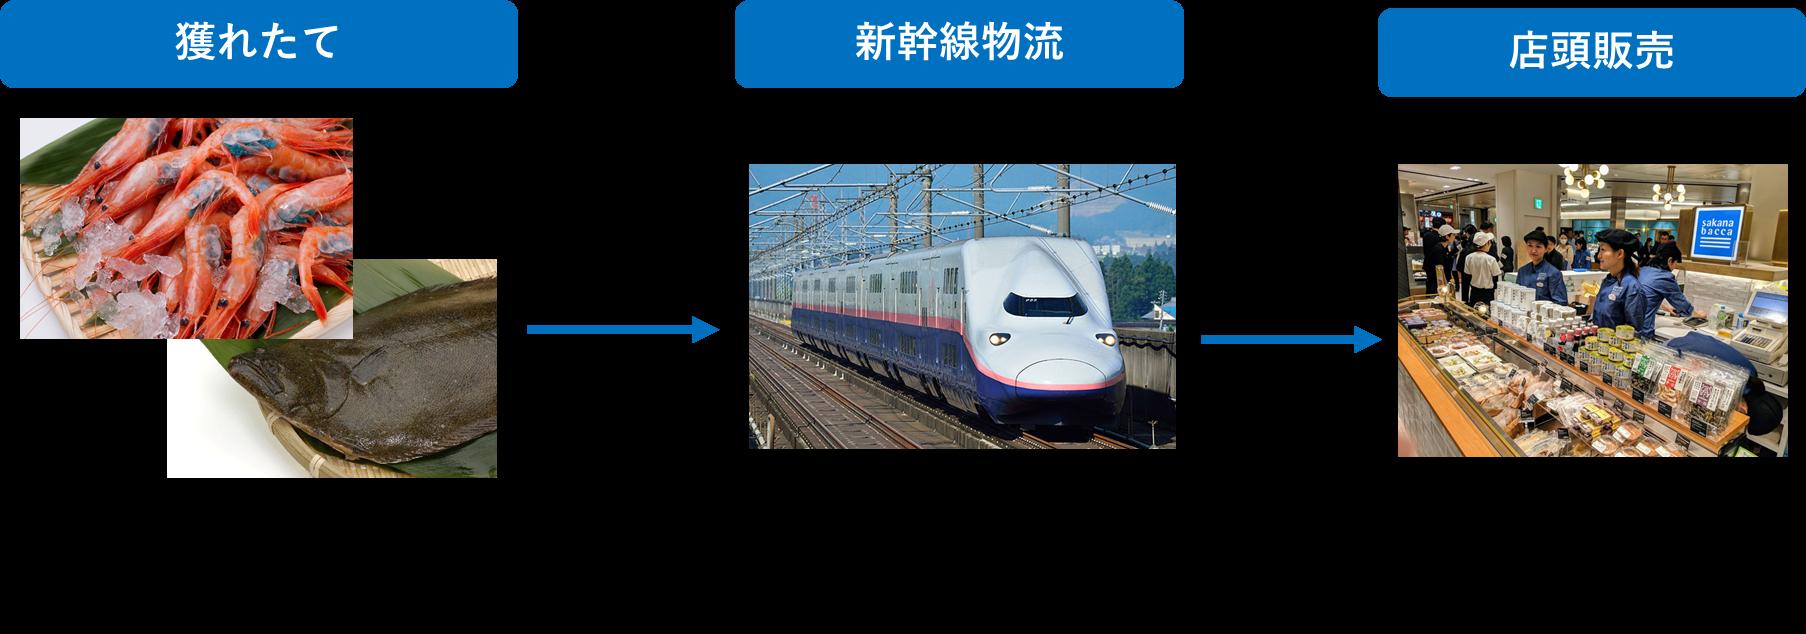 shinkansen_sengyo.png